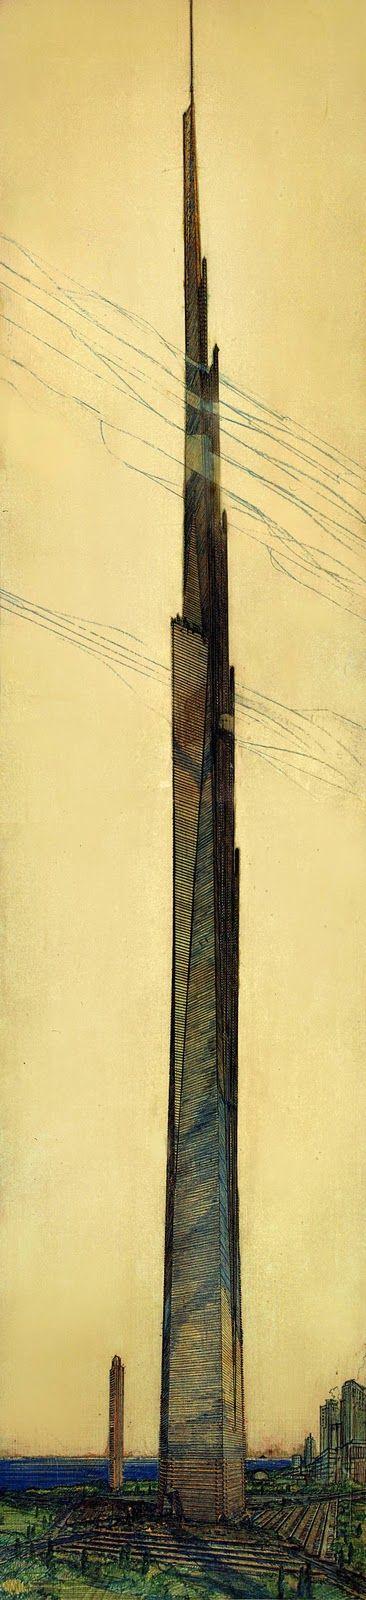 : The Tower ILLINOIS: Frank Lloyd Wrights Mile High Skyscraper